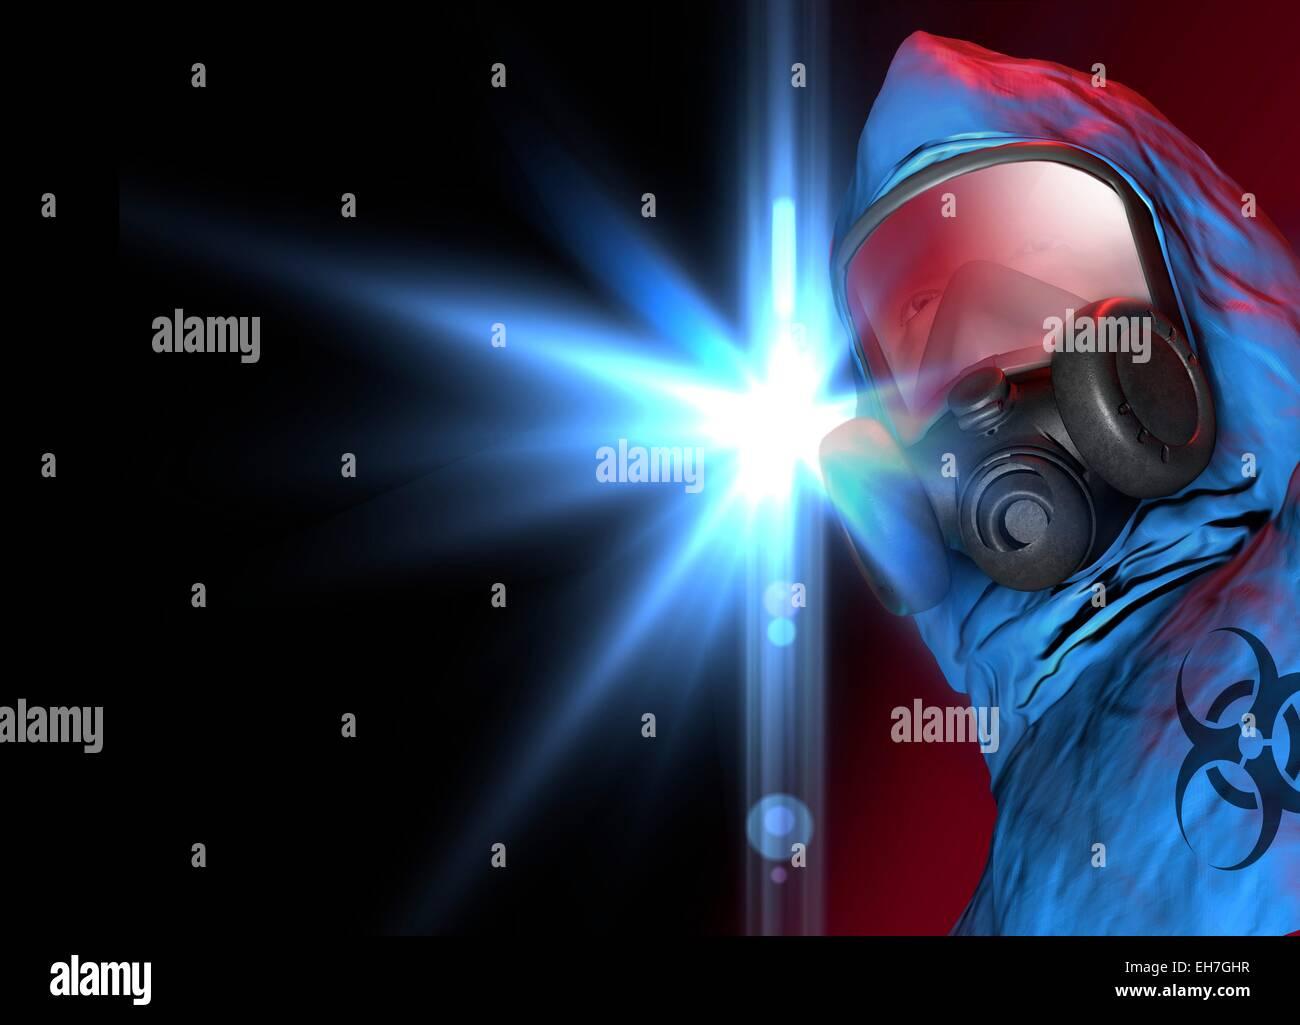 Isolation suit, artwork - Stock Image